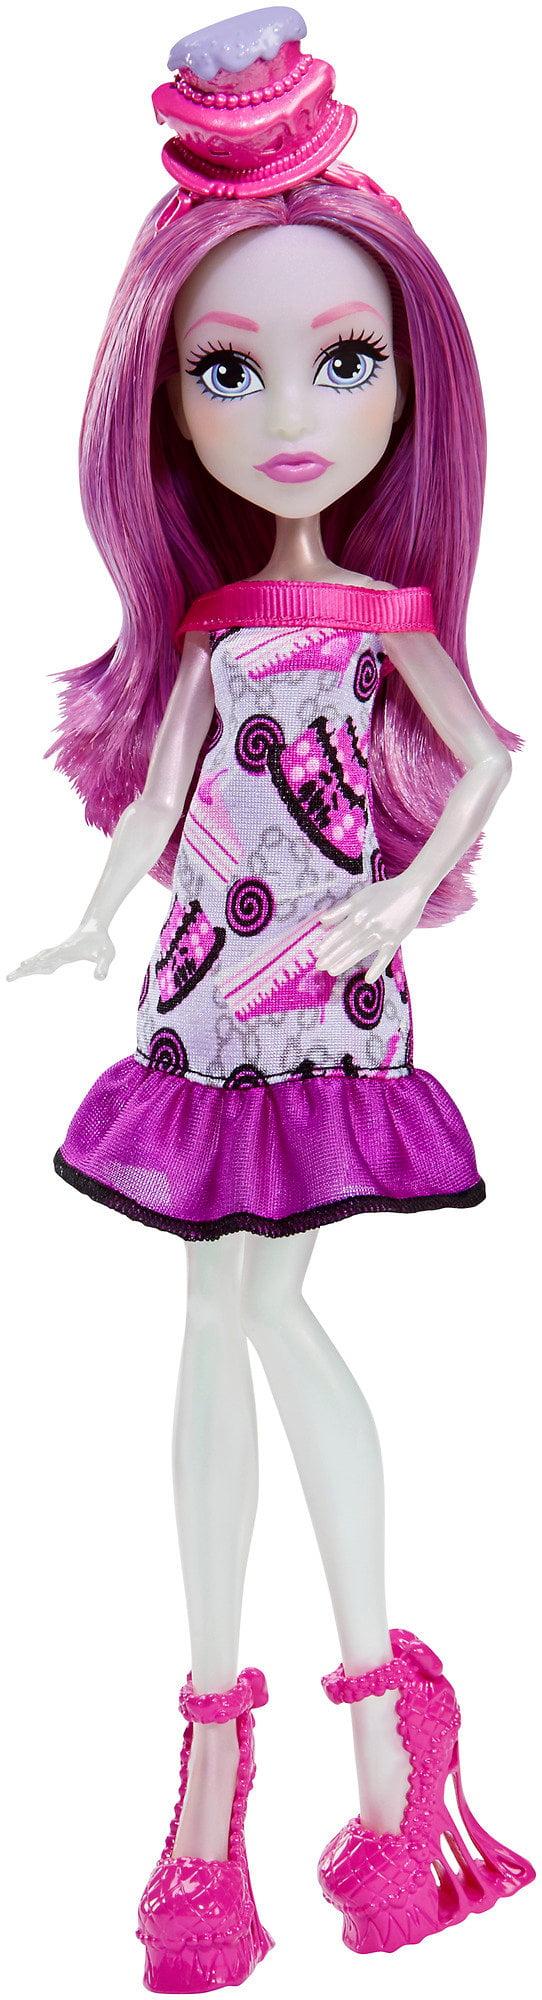 Monster High Ari Hauntington Doll by Mattel